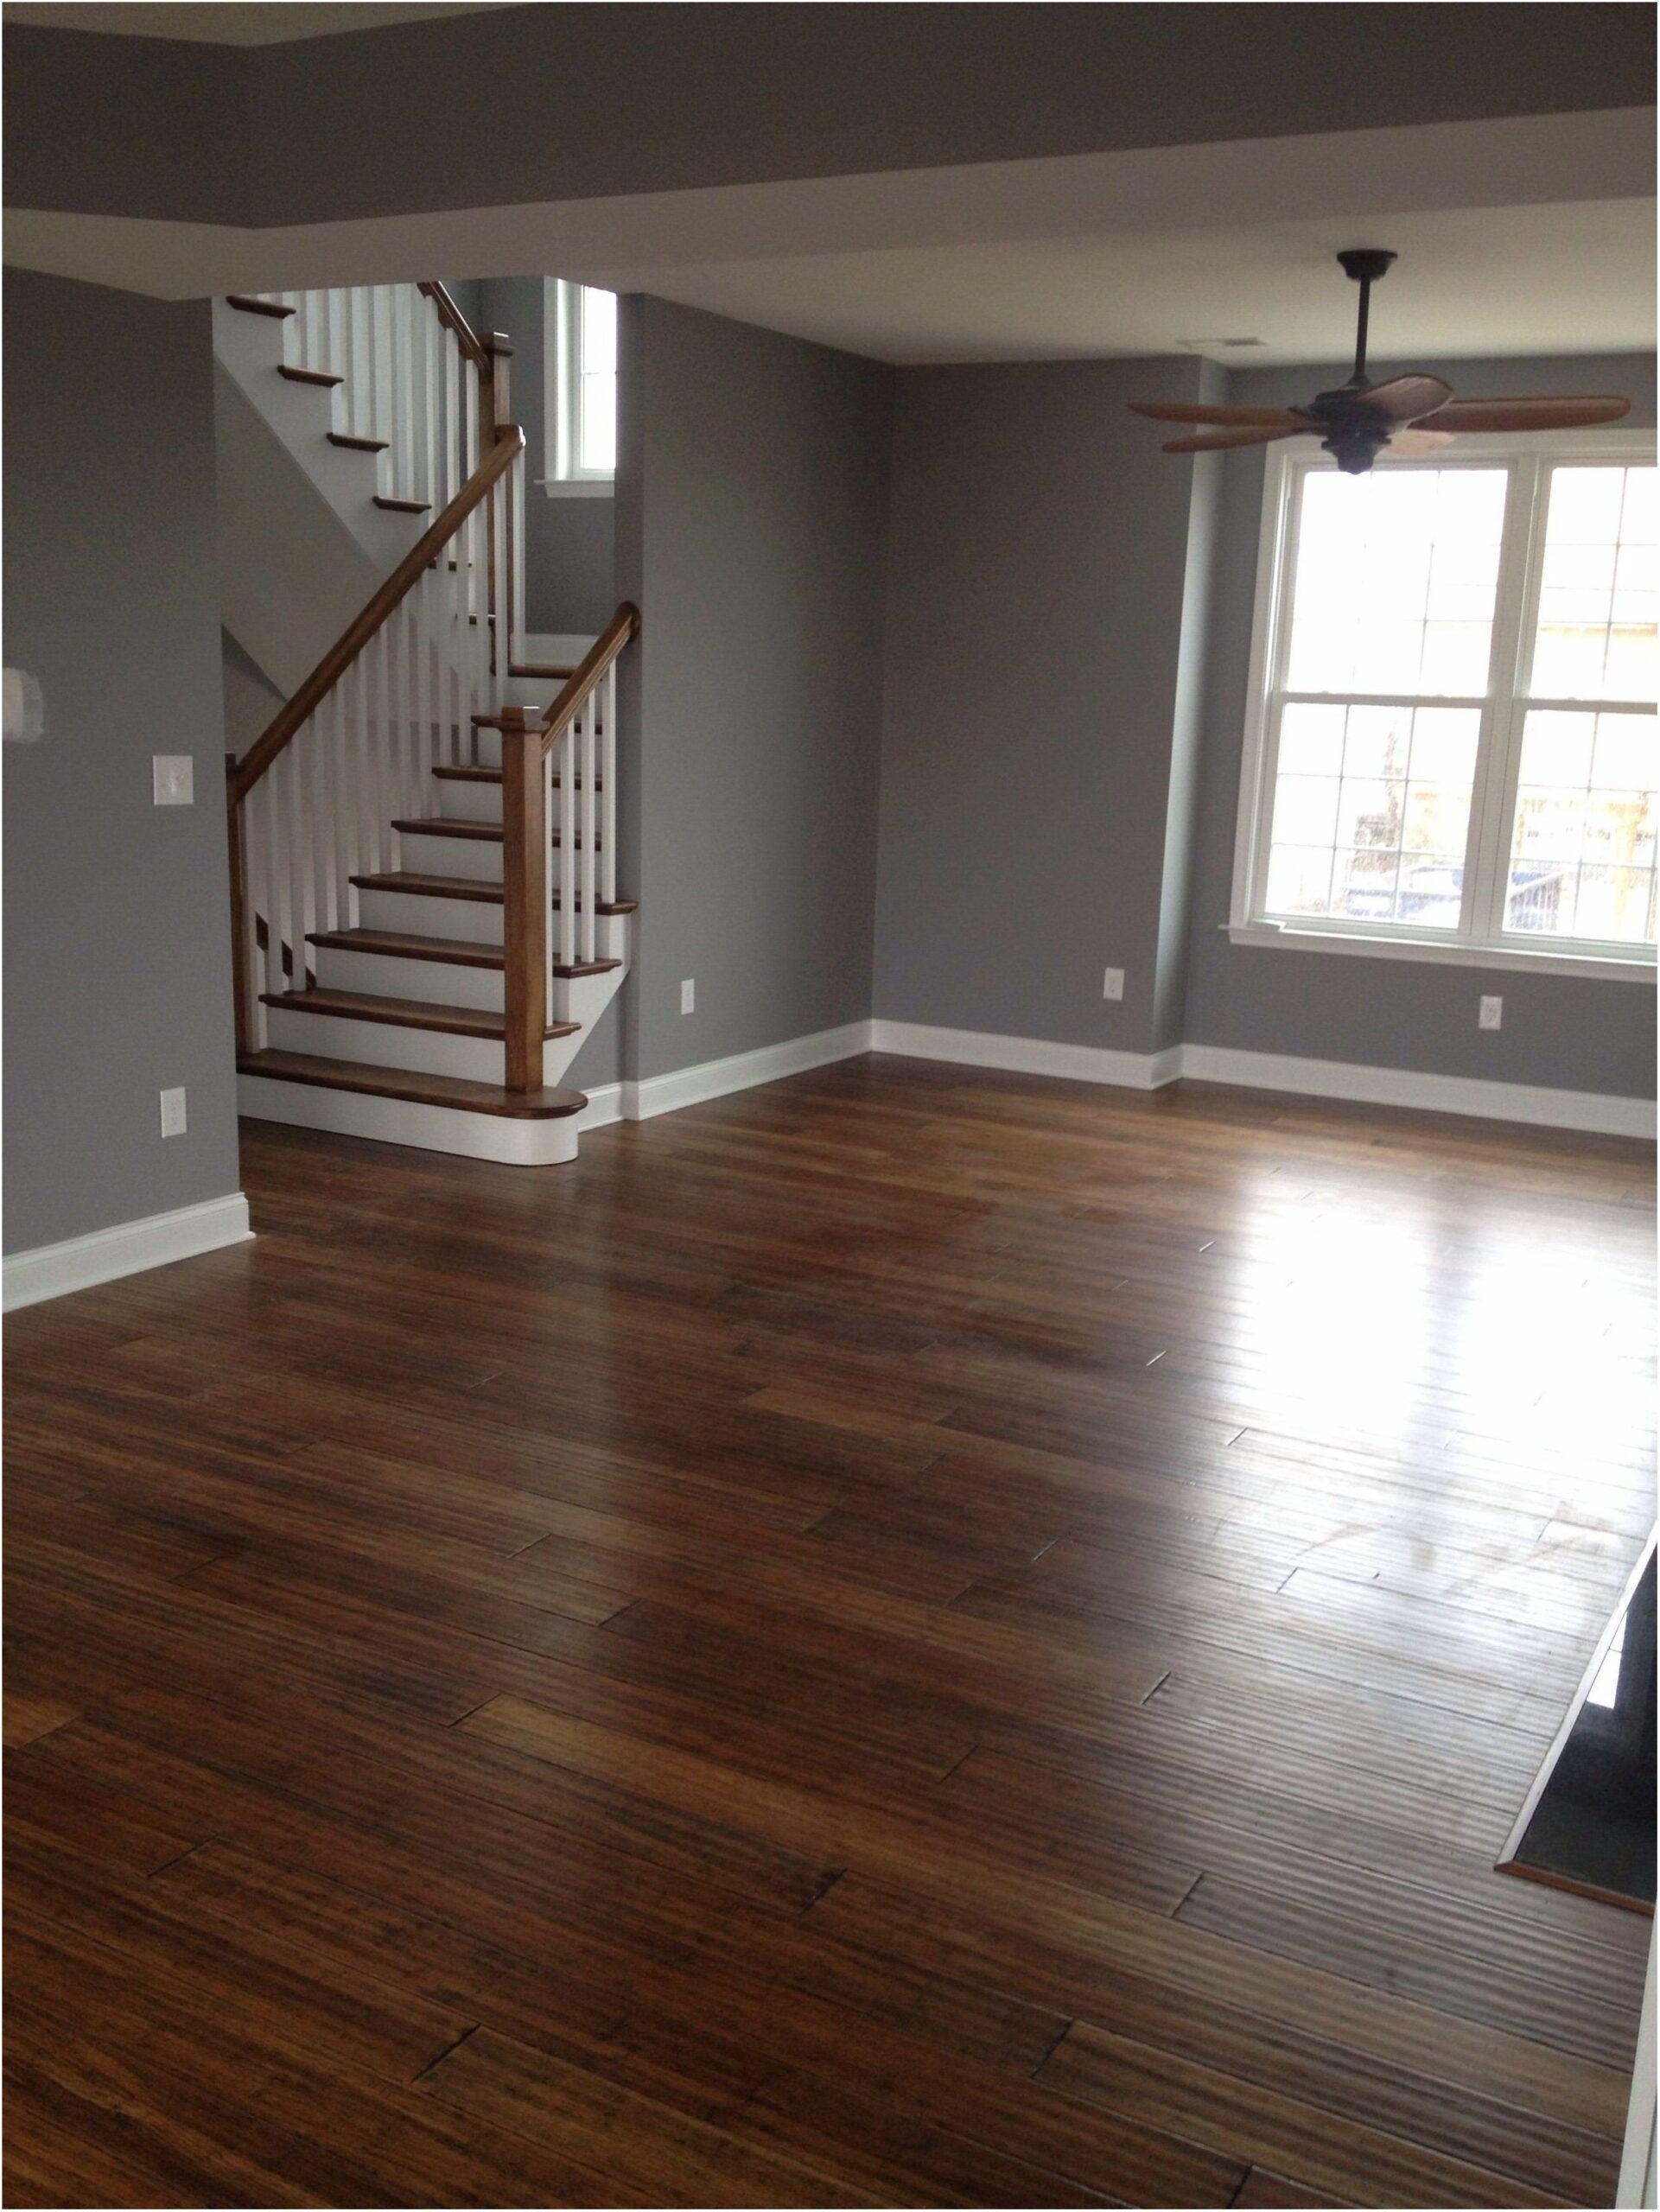 Living Room Paint Ideas Dark Floors Living Room Wood Floor Dark Bamboo Flooring Paint Colors For Living Room